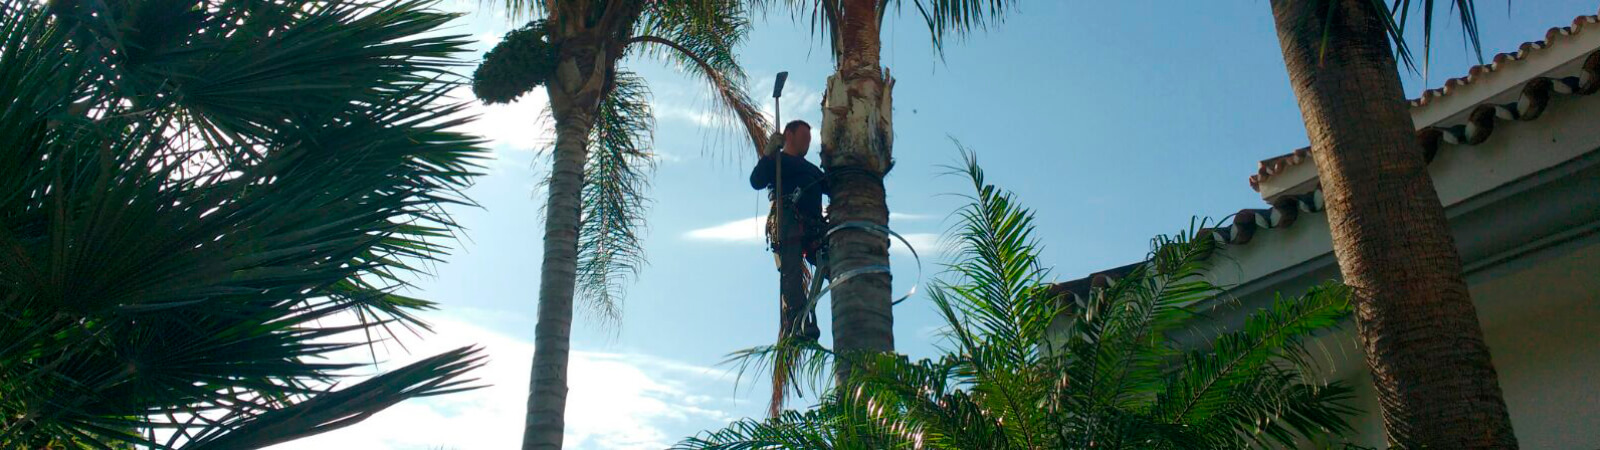 Podando palmeras en Marbela